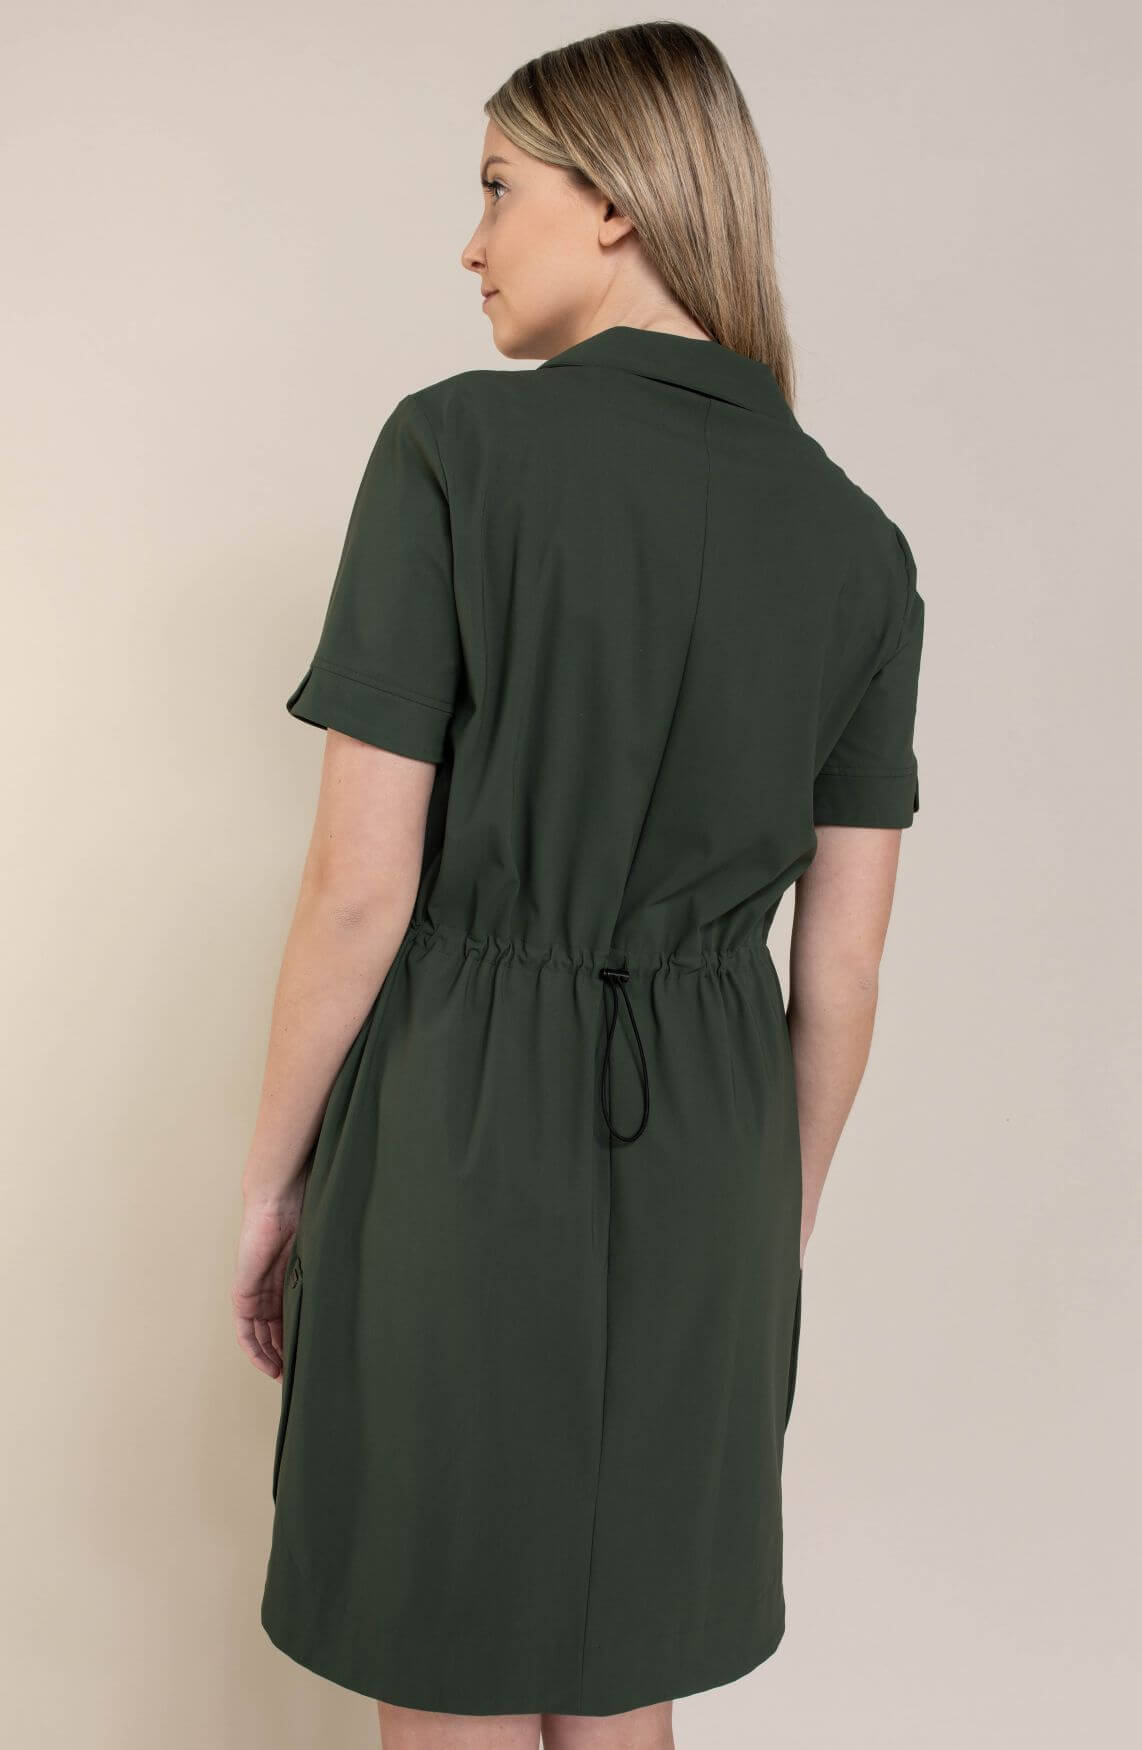 Jane Lushka Dames Lucia jurk Groen